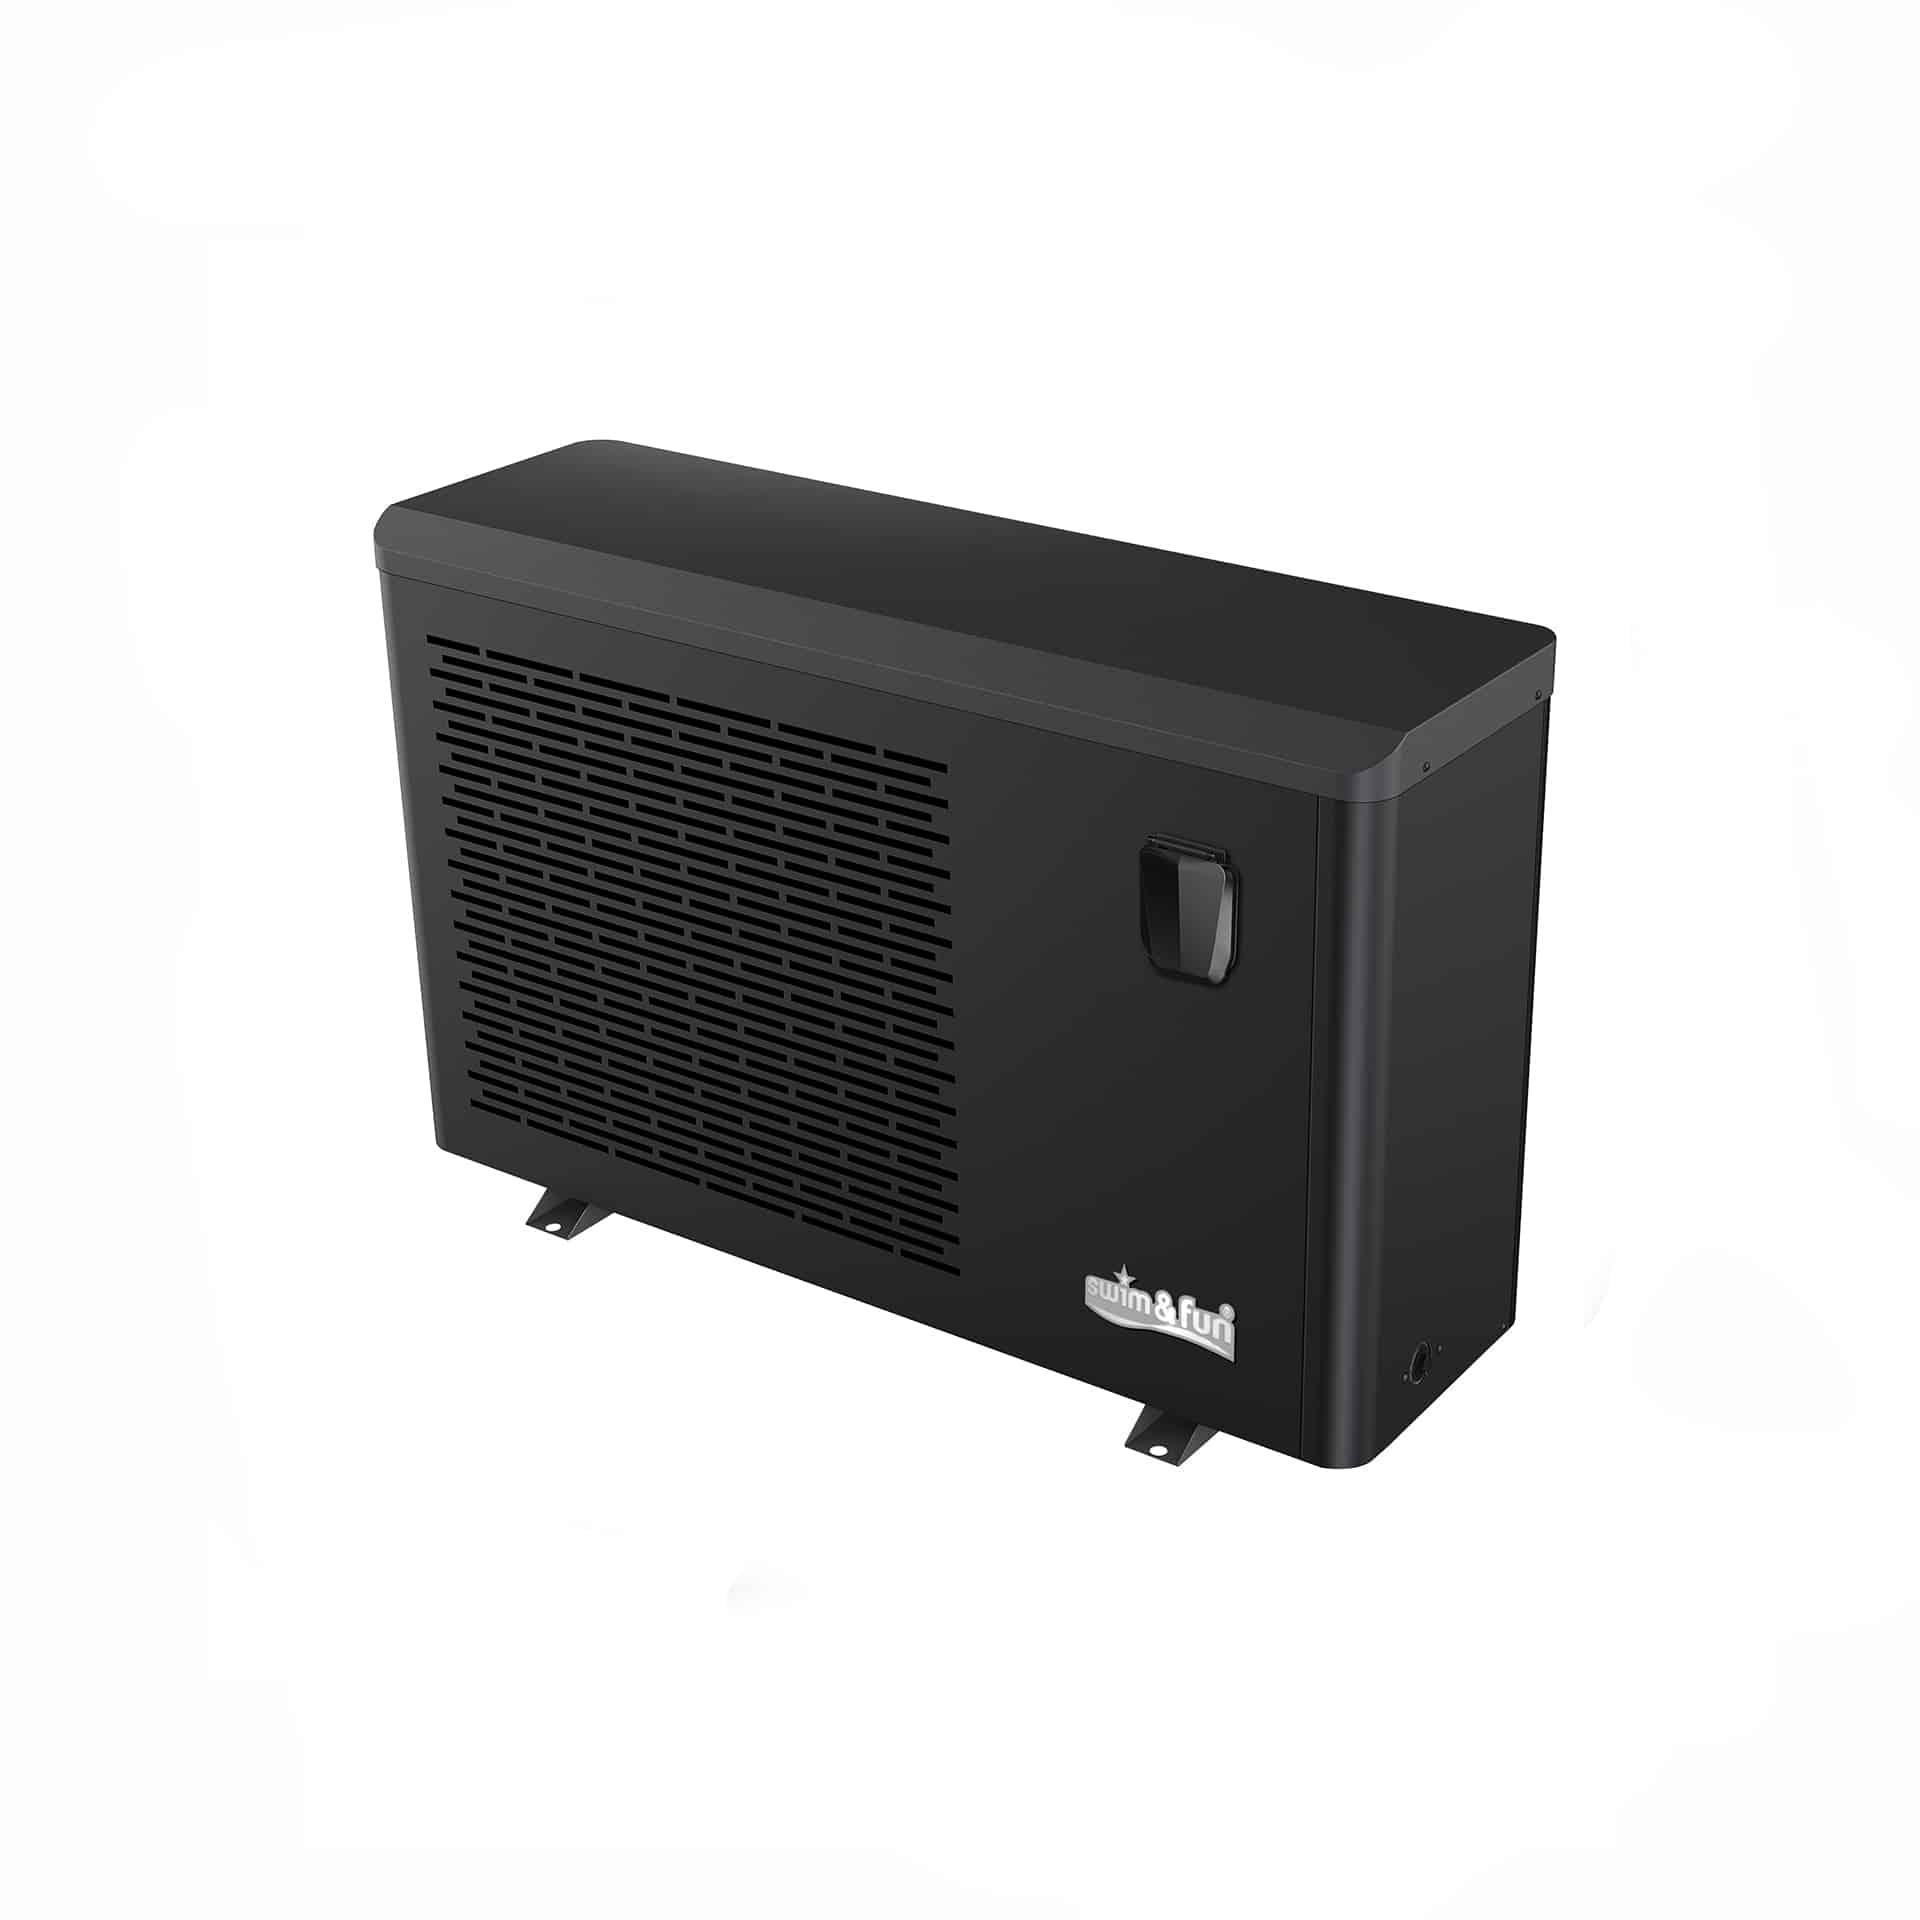 HeatBooster Pro Varmepumpe med WiFi 9 KW